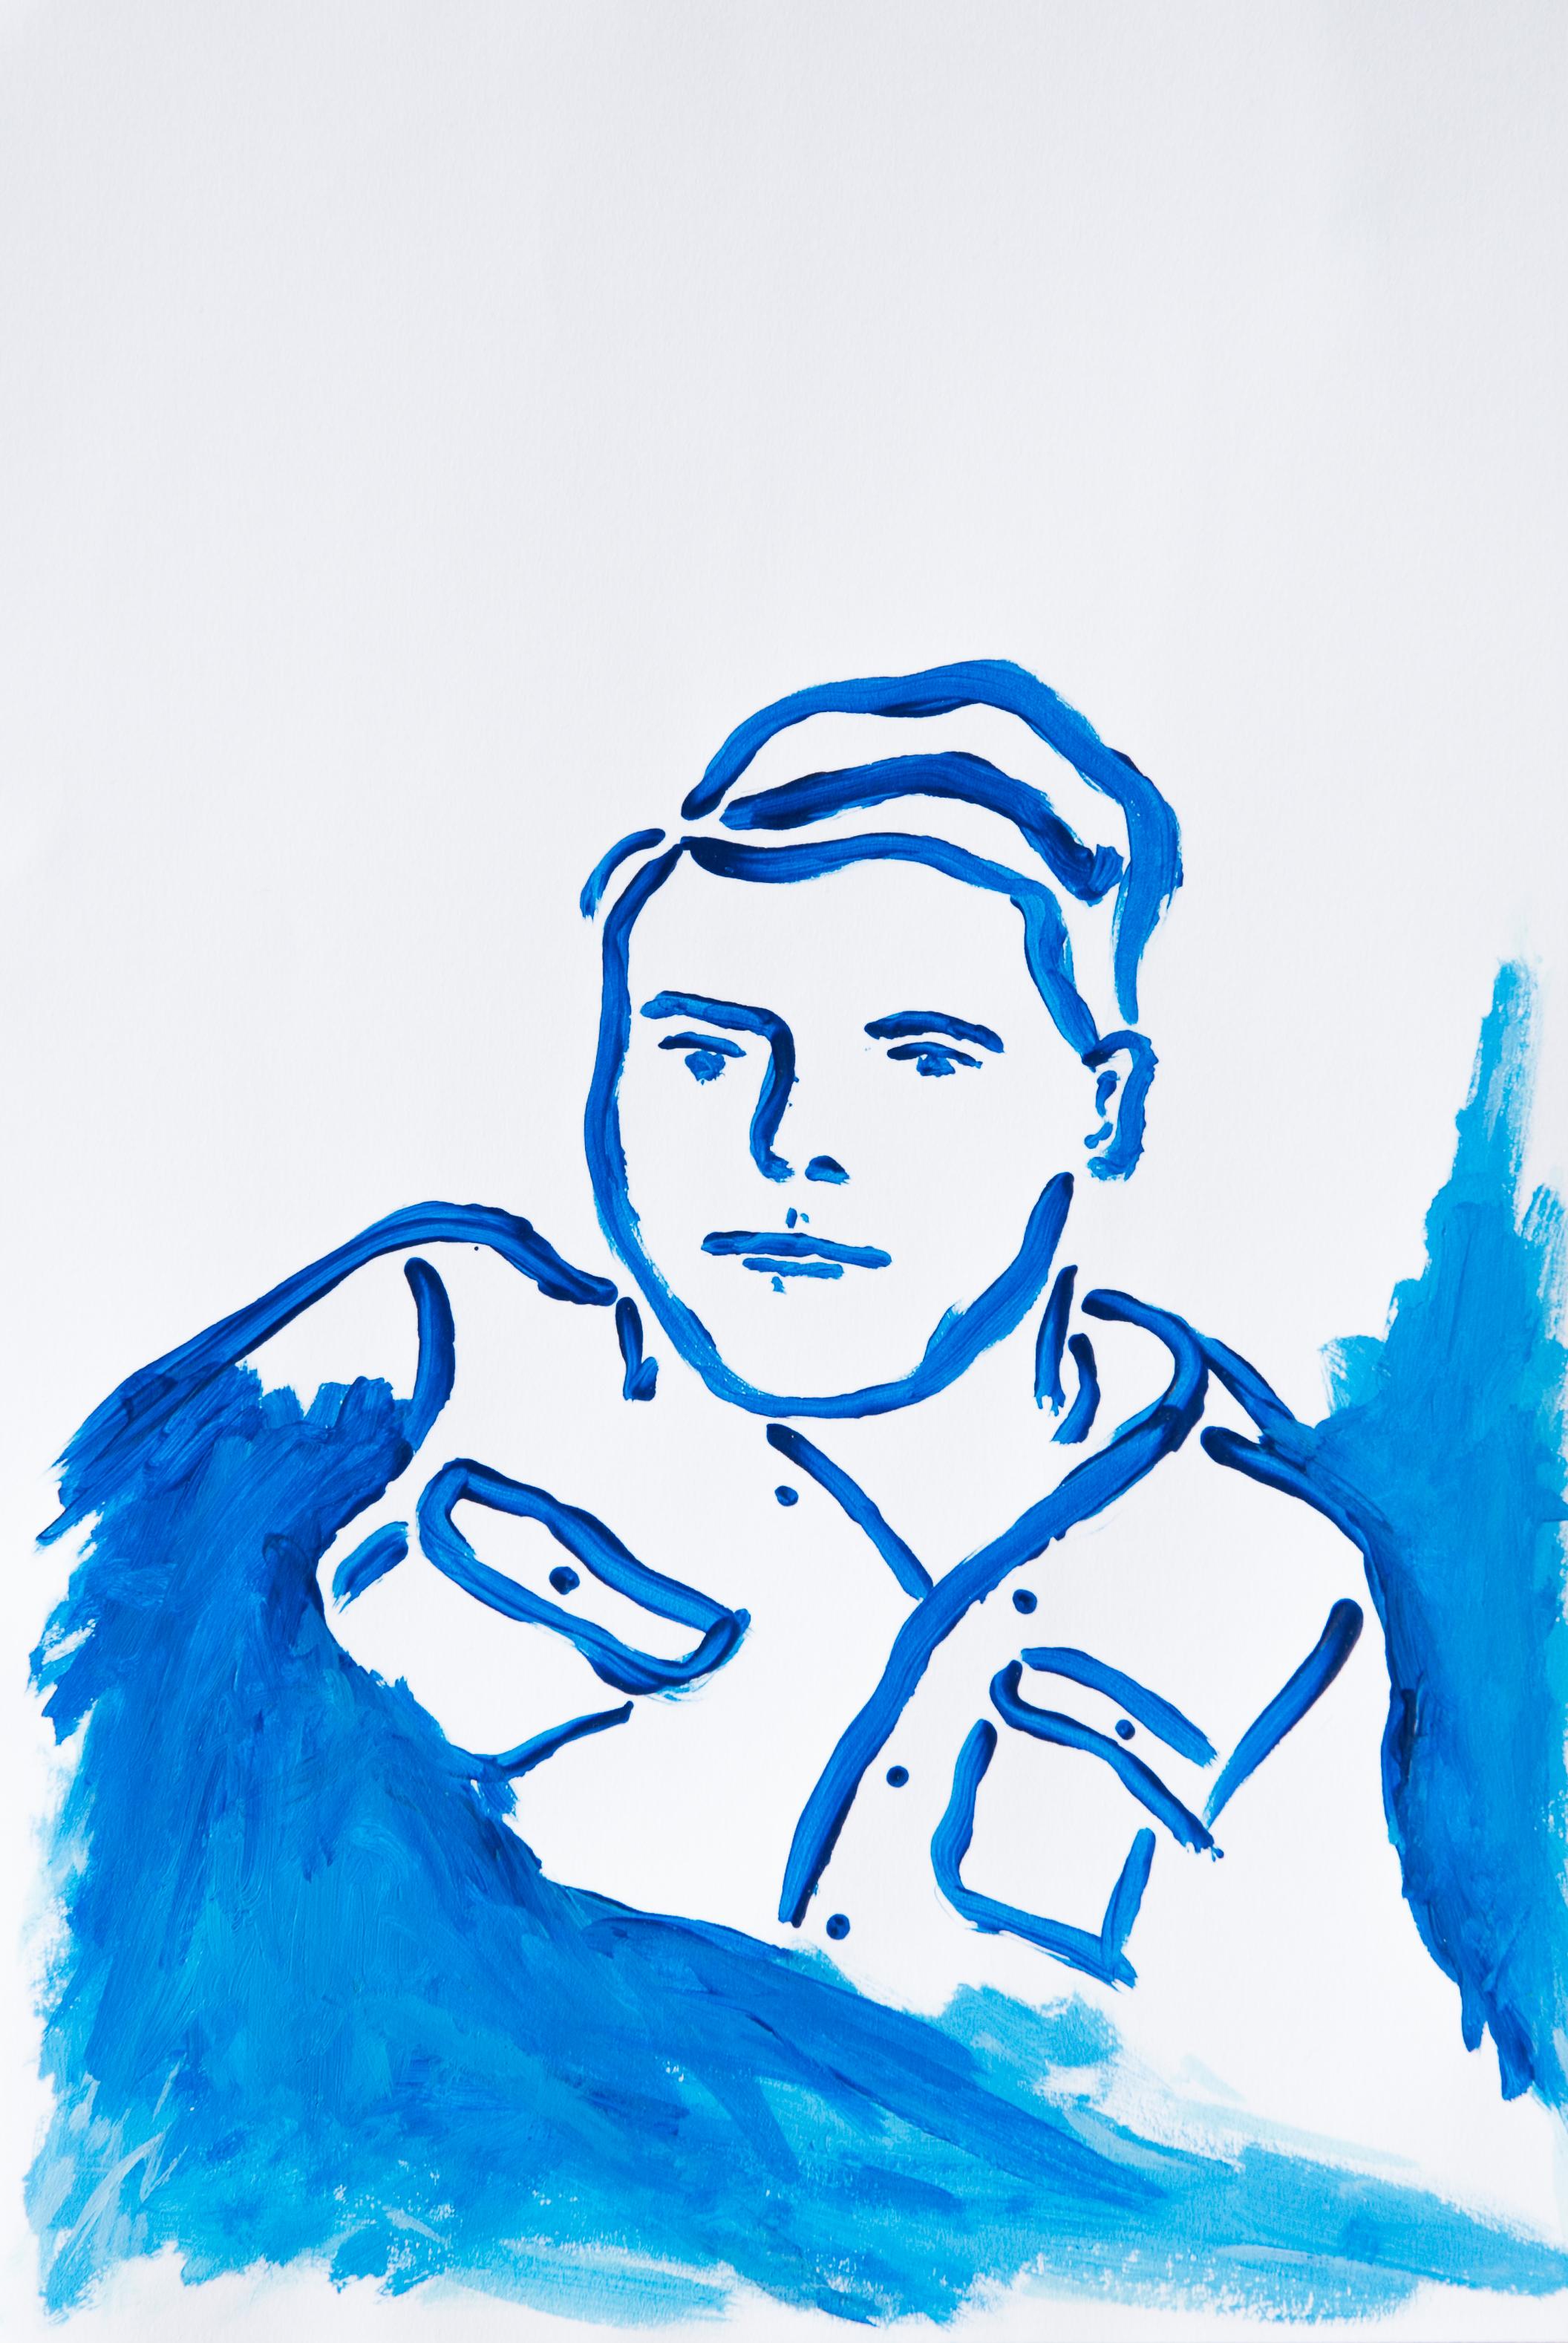 Brad in Blue,  2019